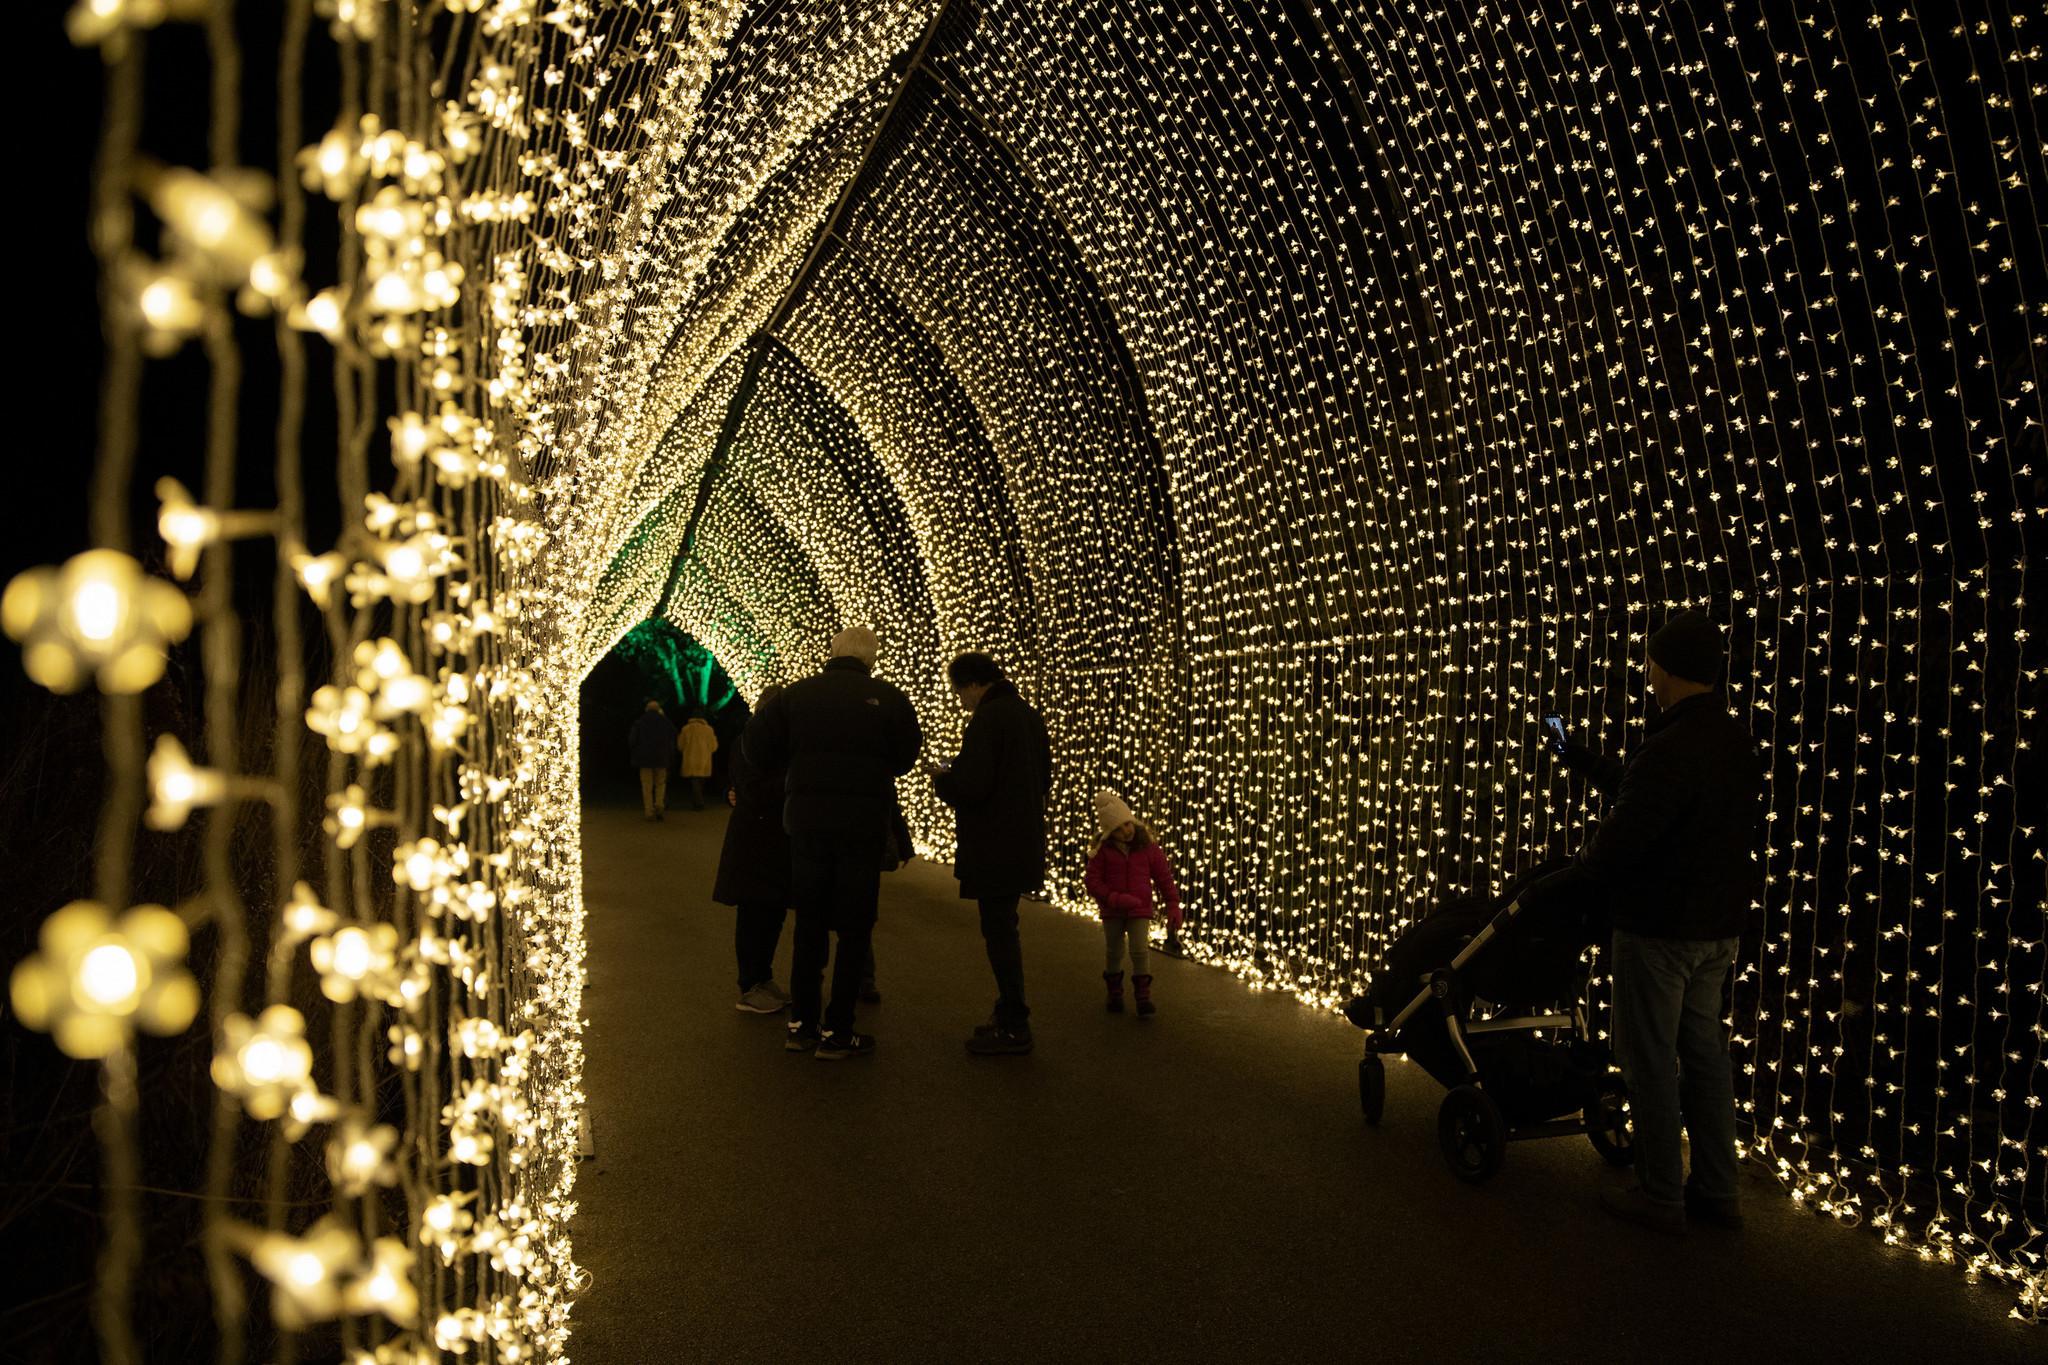 Drive Through Christmas Lights Illinois 2020 Christmas lights Chicago: Where to find bold holiday lights